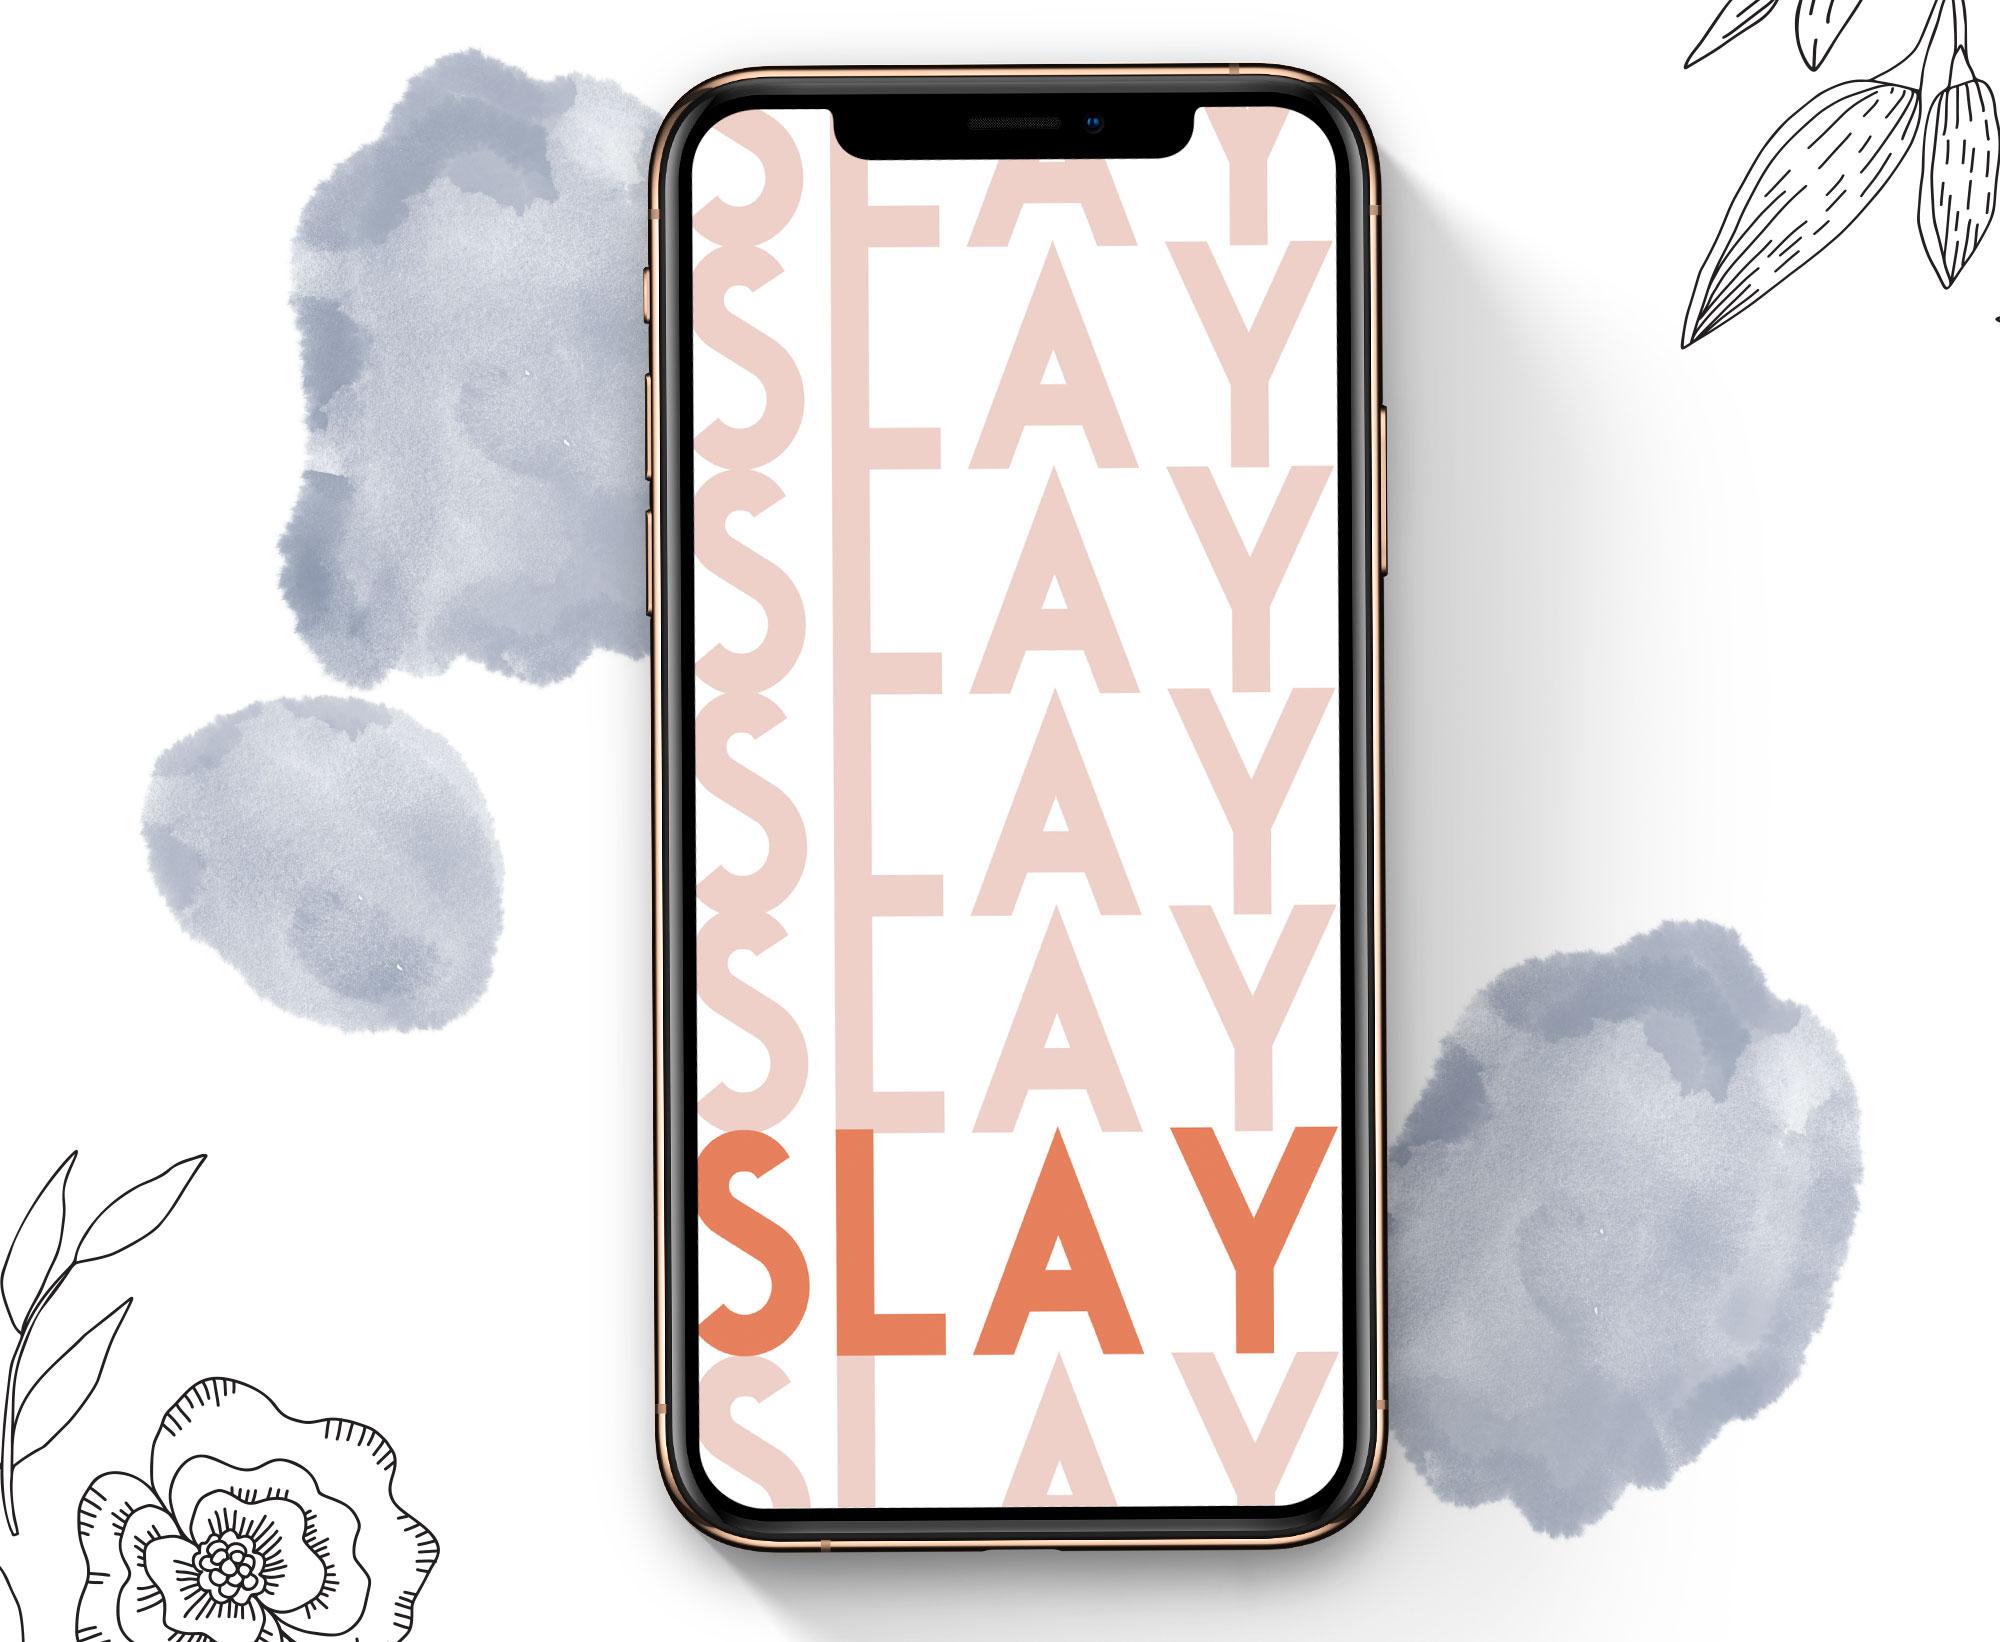 slay.jpg